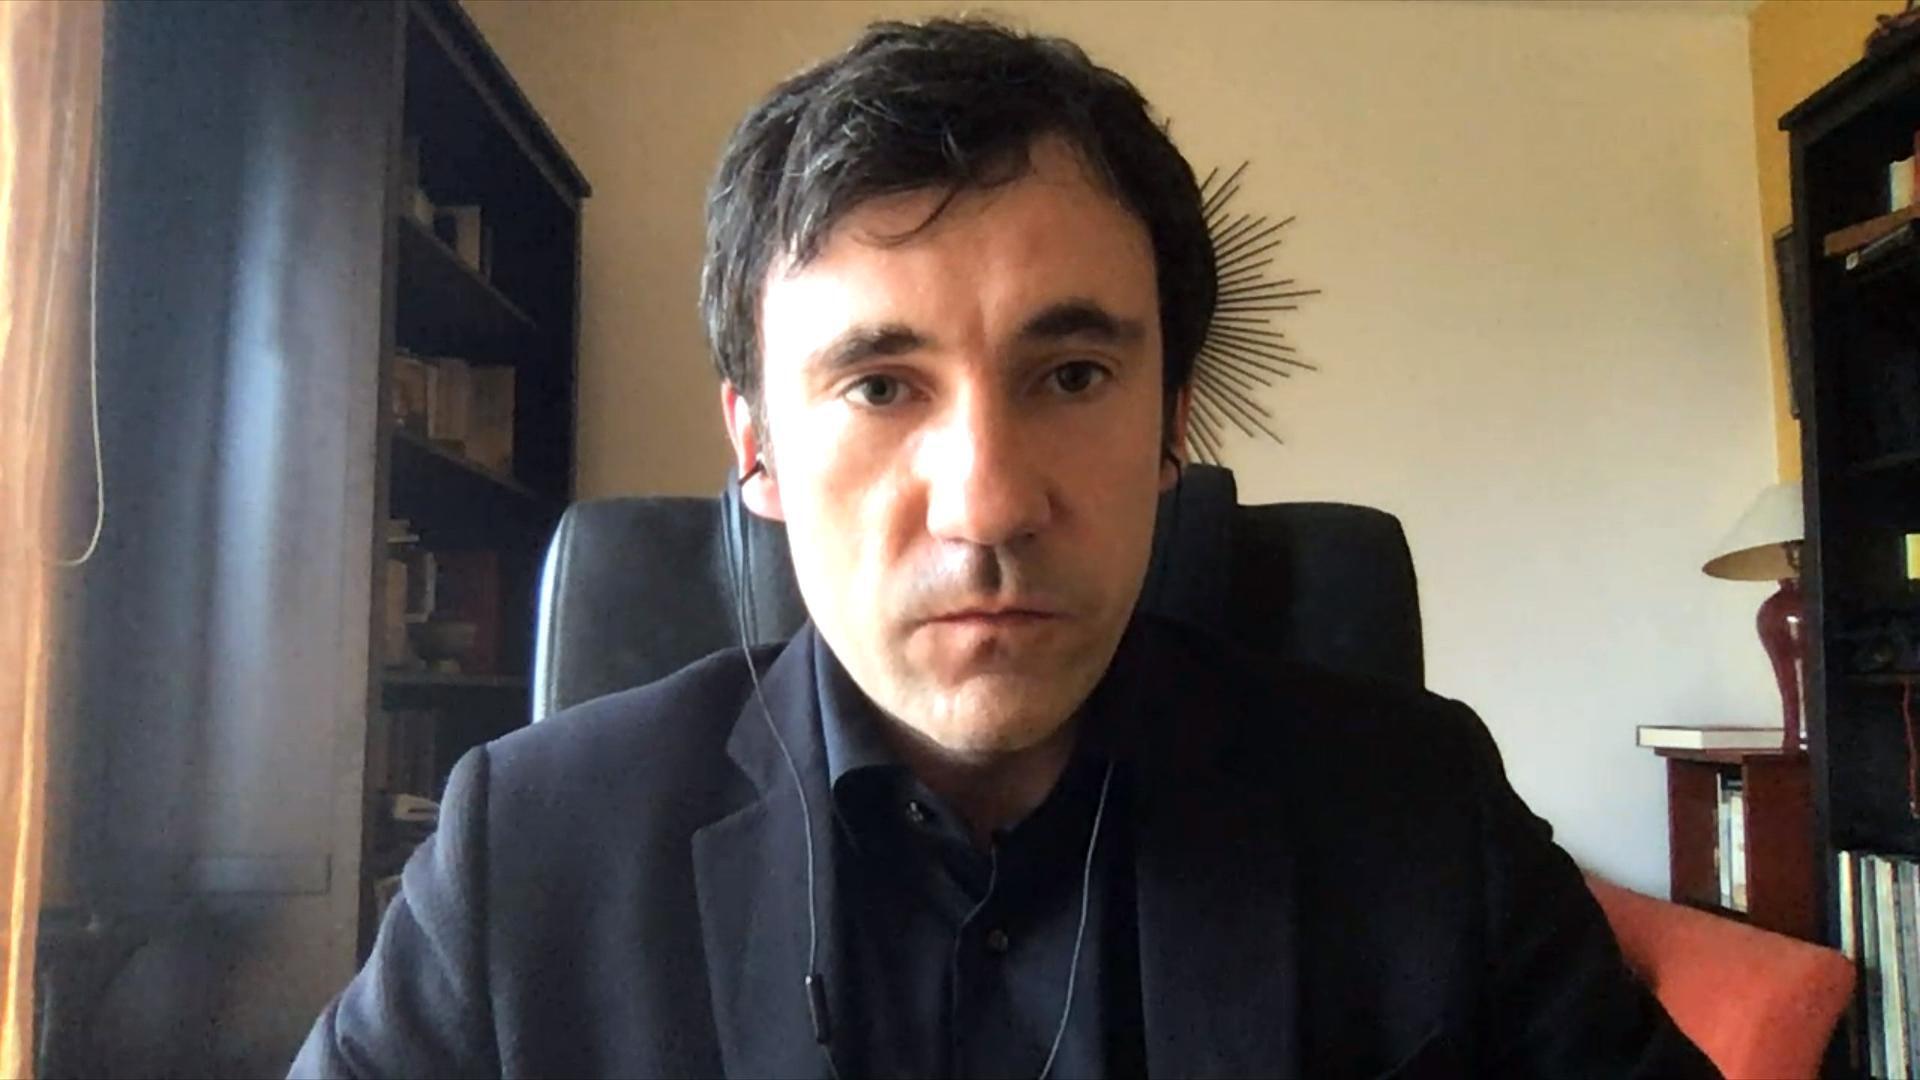 Mathieu Duchatel